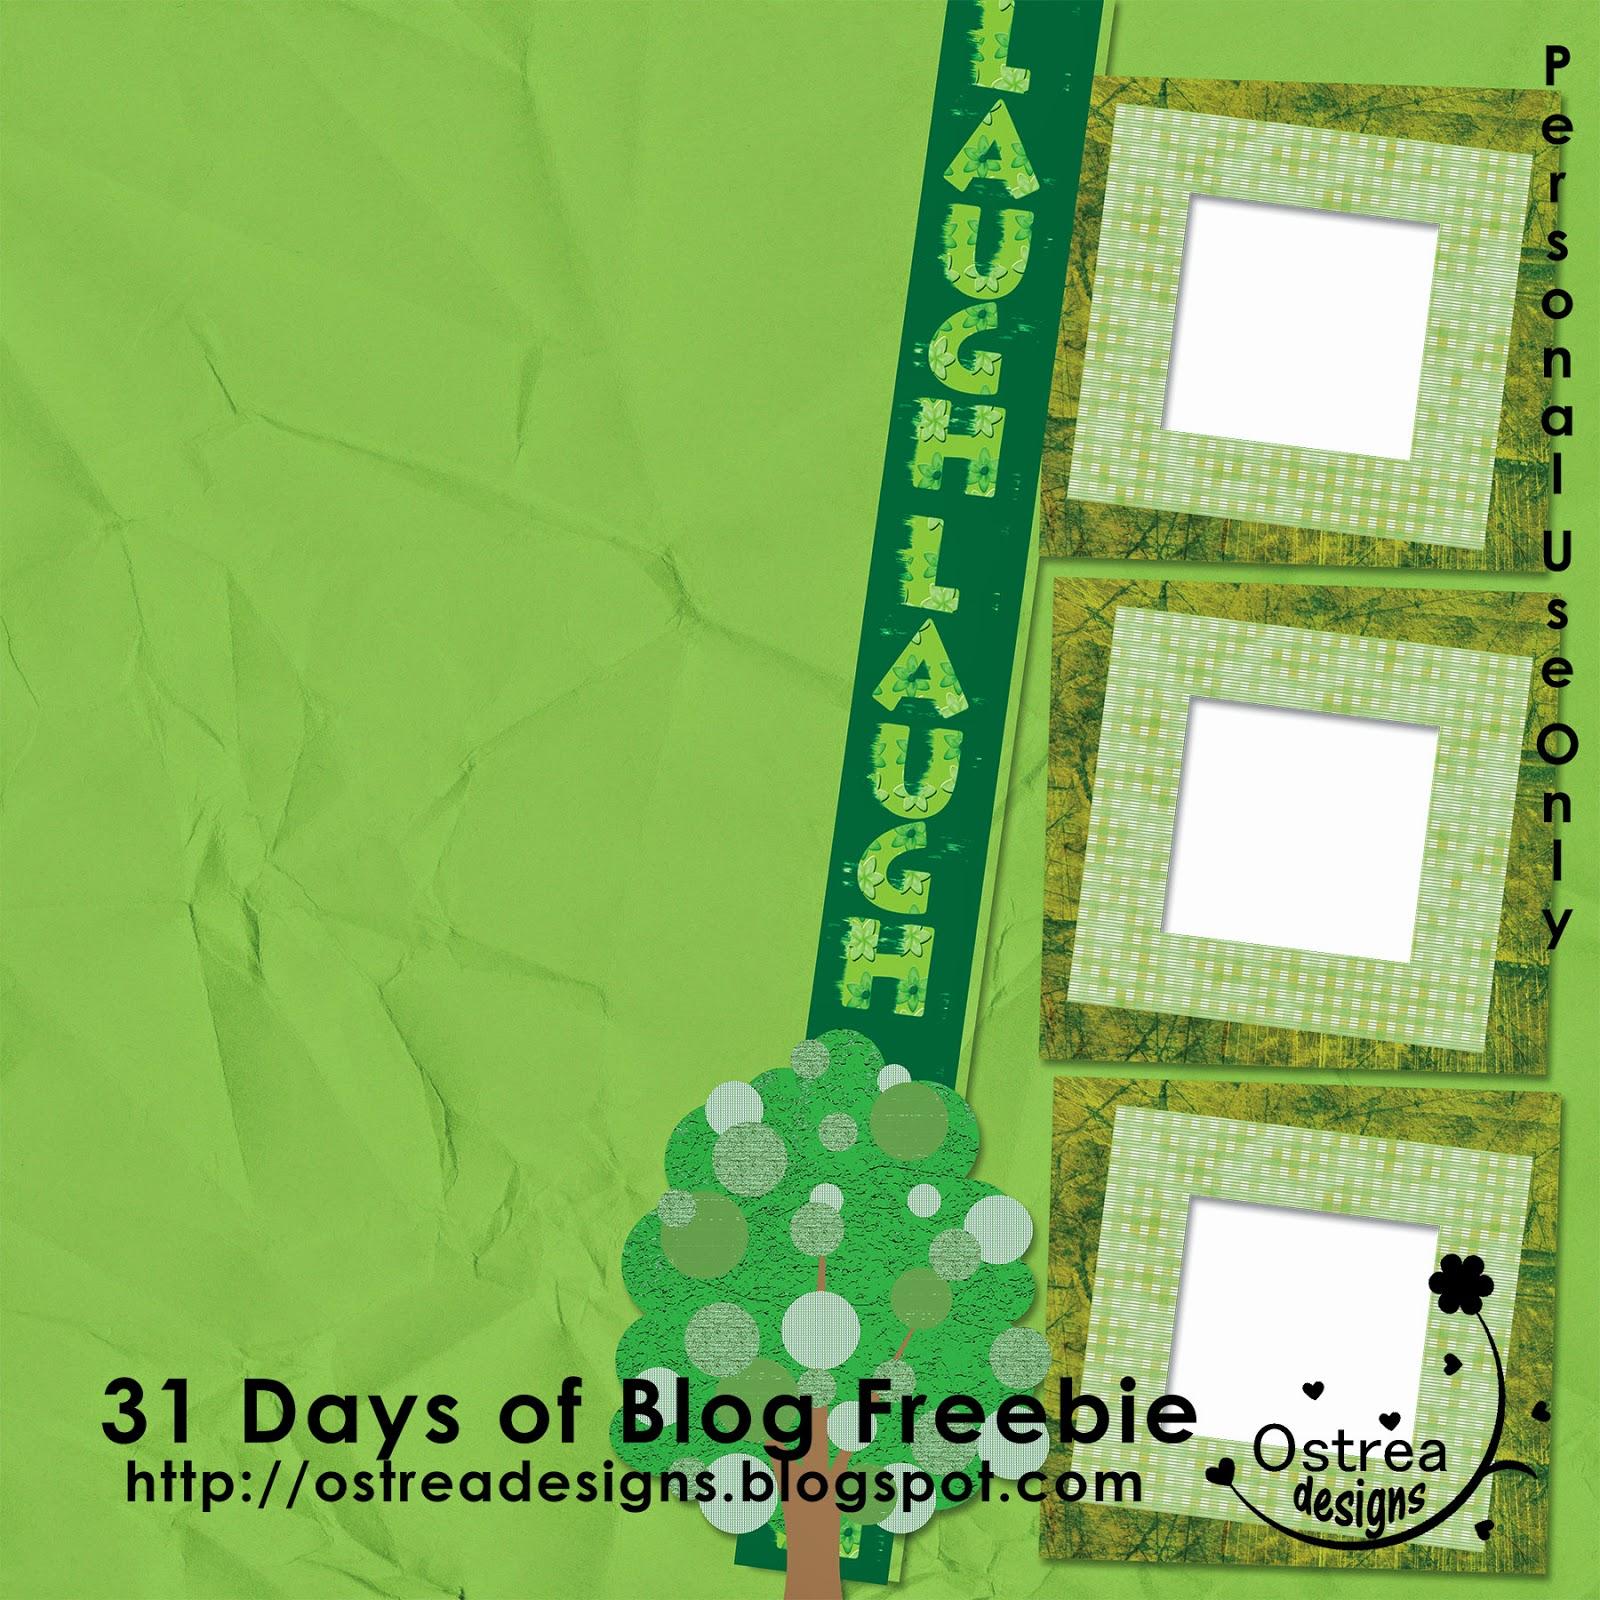 http://4.bp.blogspot.com/-WhWweeS4ToE/VHbFV1KP-SI/AAAAAAAABfY/PrPaIF65oSo/s1600/OstreaDesigns_Dec05p.jpg